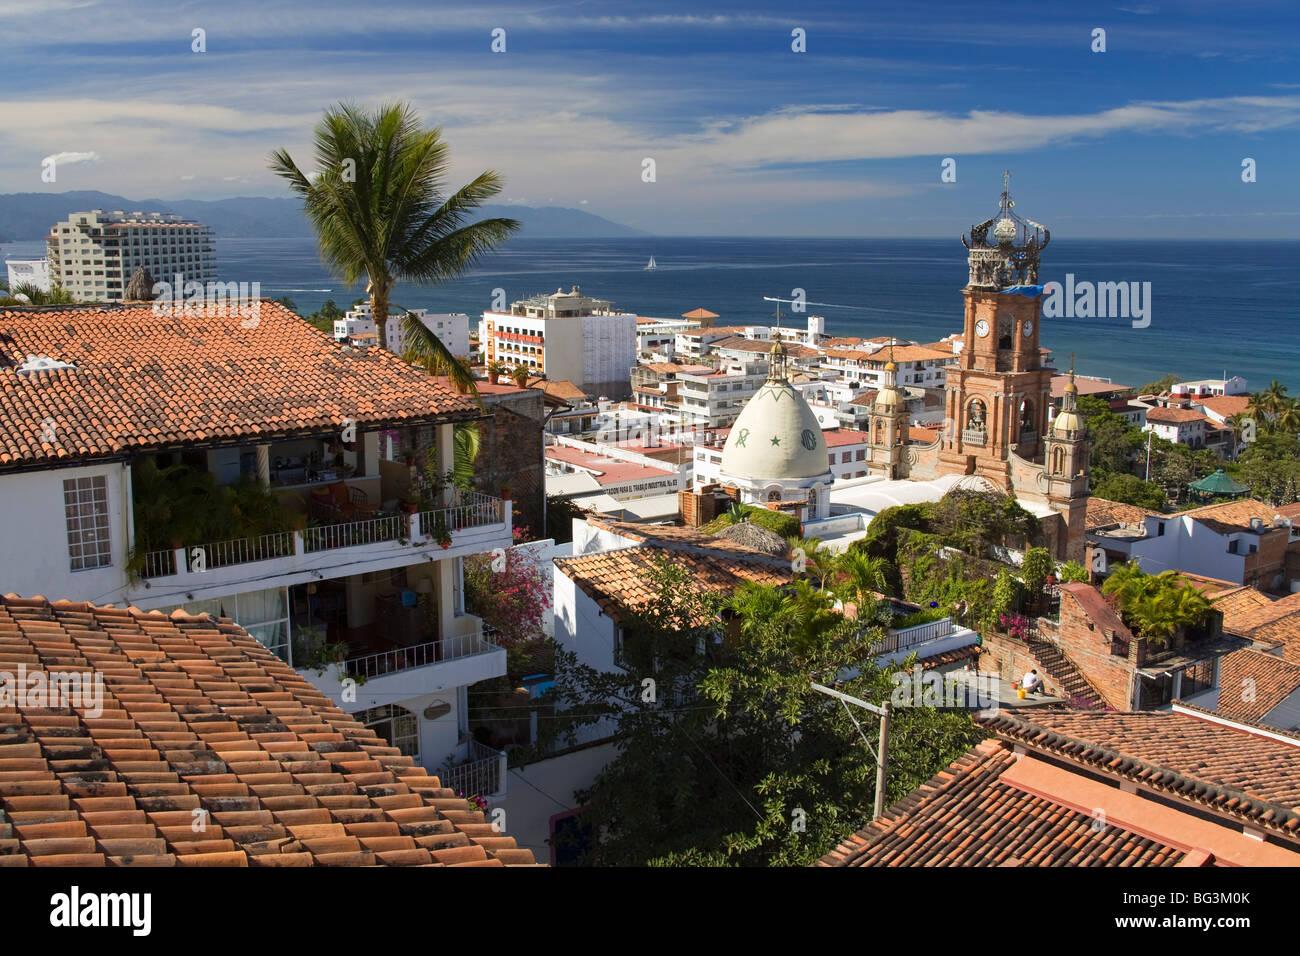 Ziegeldächer, Puerto Vallarta, Jalisco Staat, Mexiko, Nordamerika Stockbild